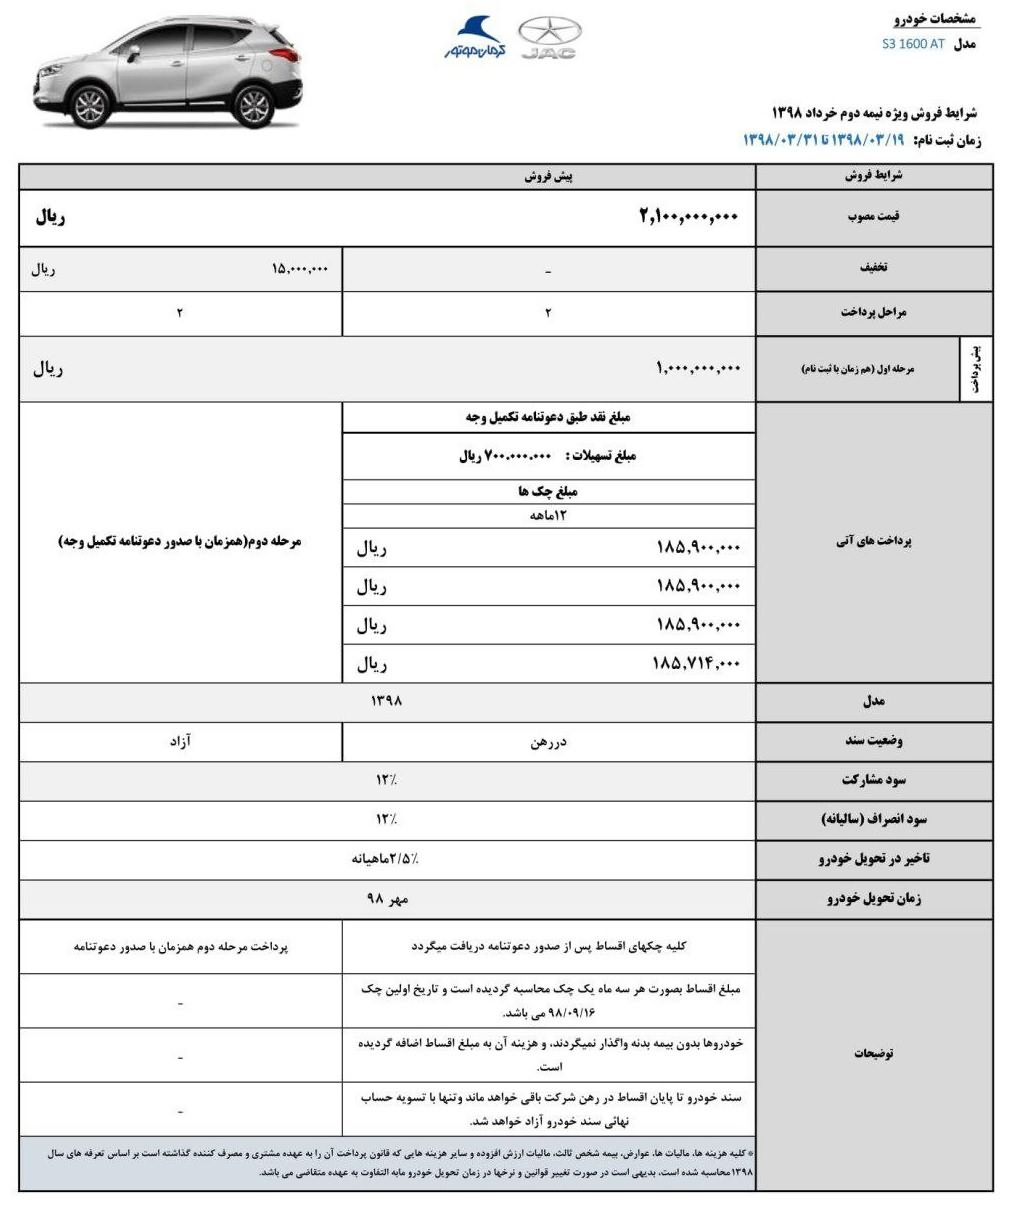 طرح فروش اقساطی جک اس ۳ (Jac S3) اتوماتیک خرداد ۹۸